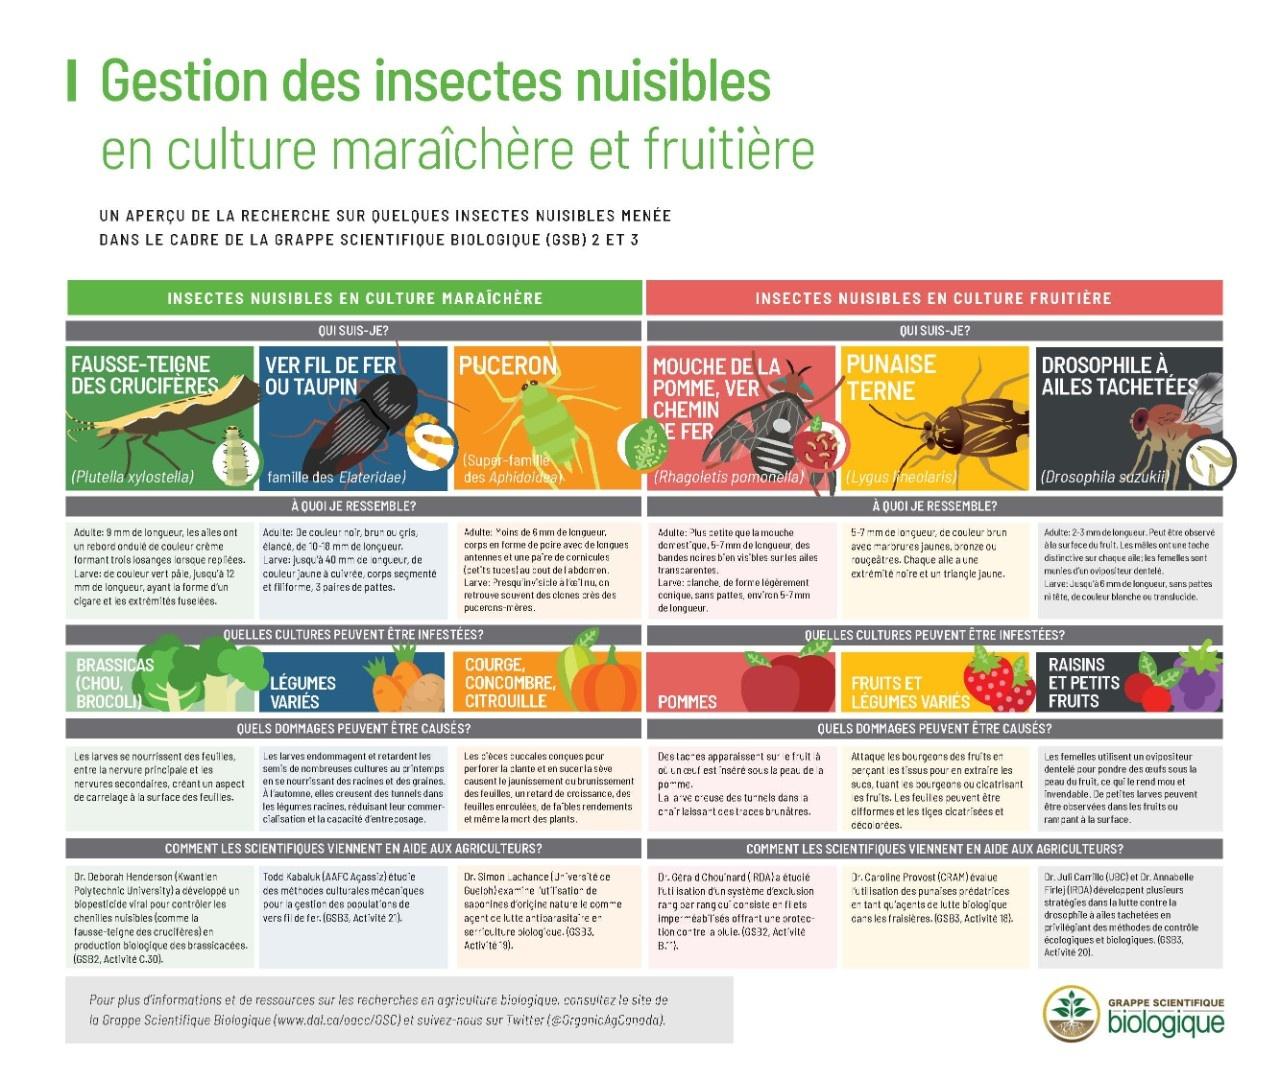 FINAL- Pest infographic-FR